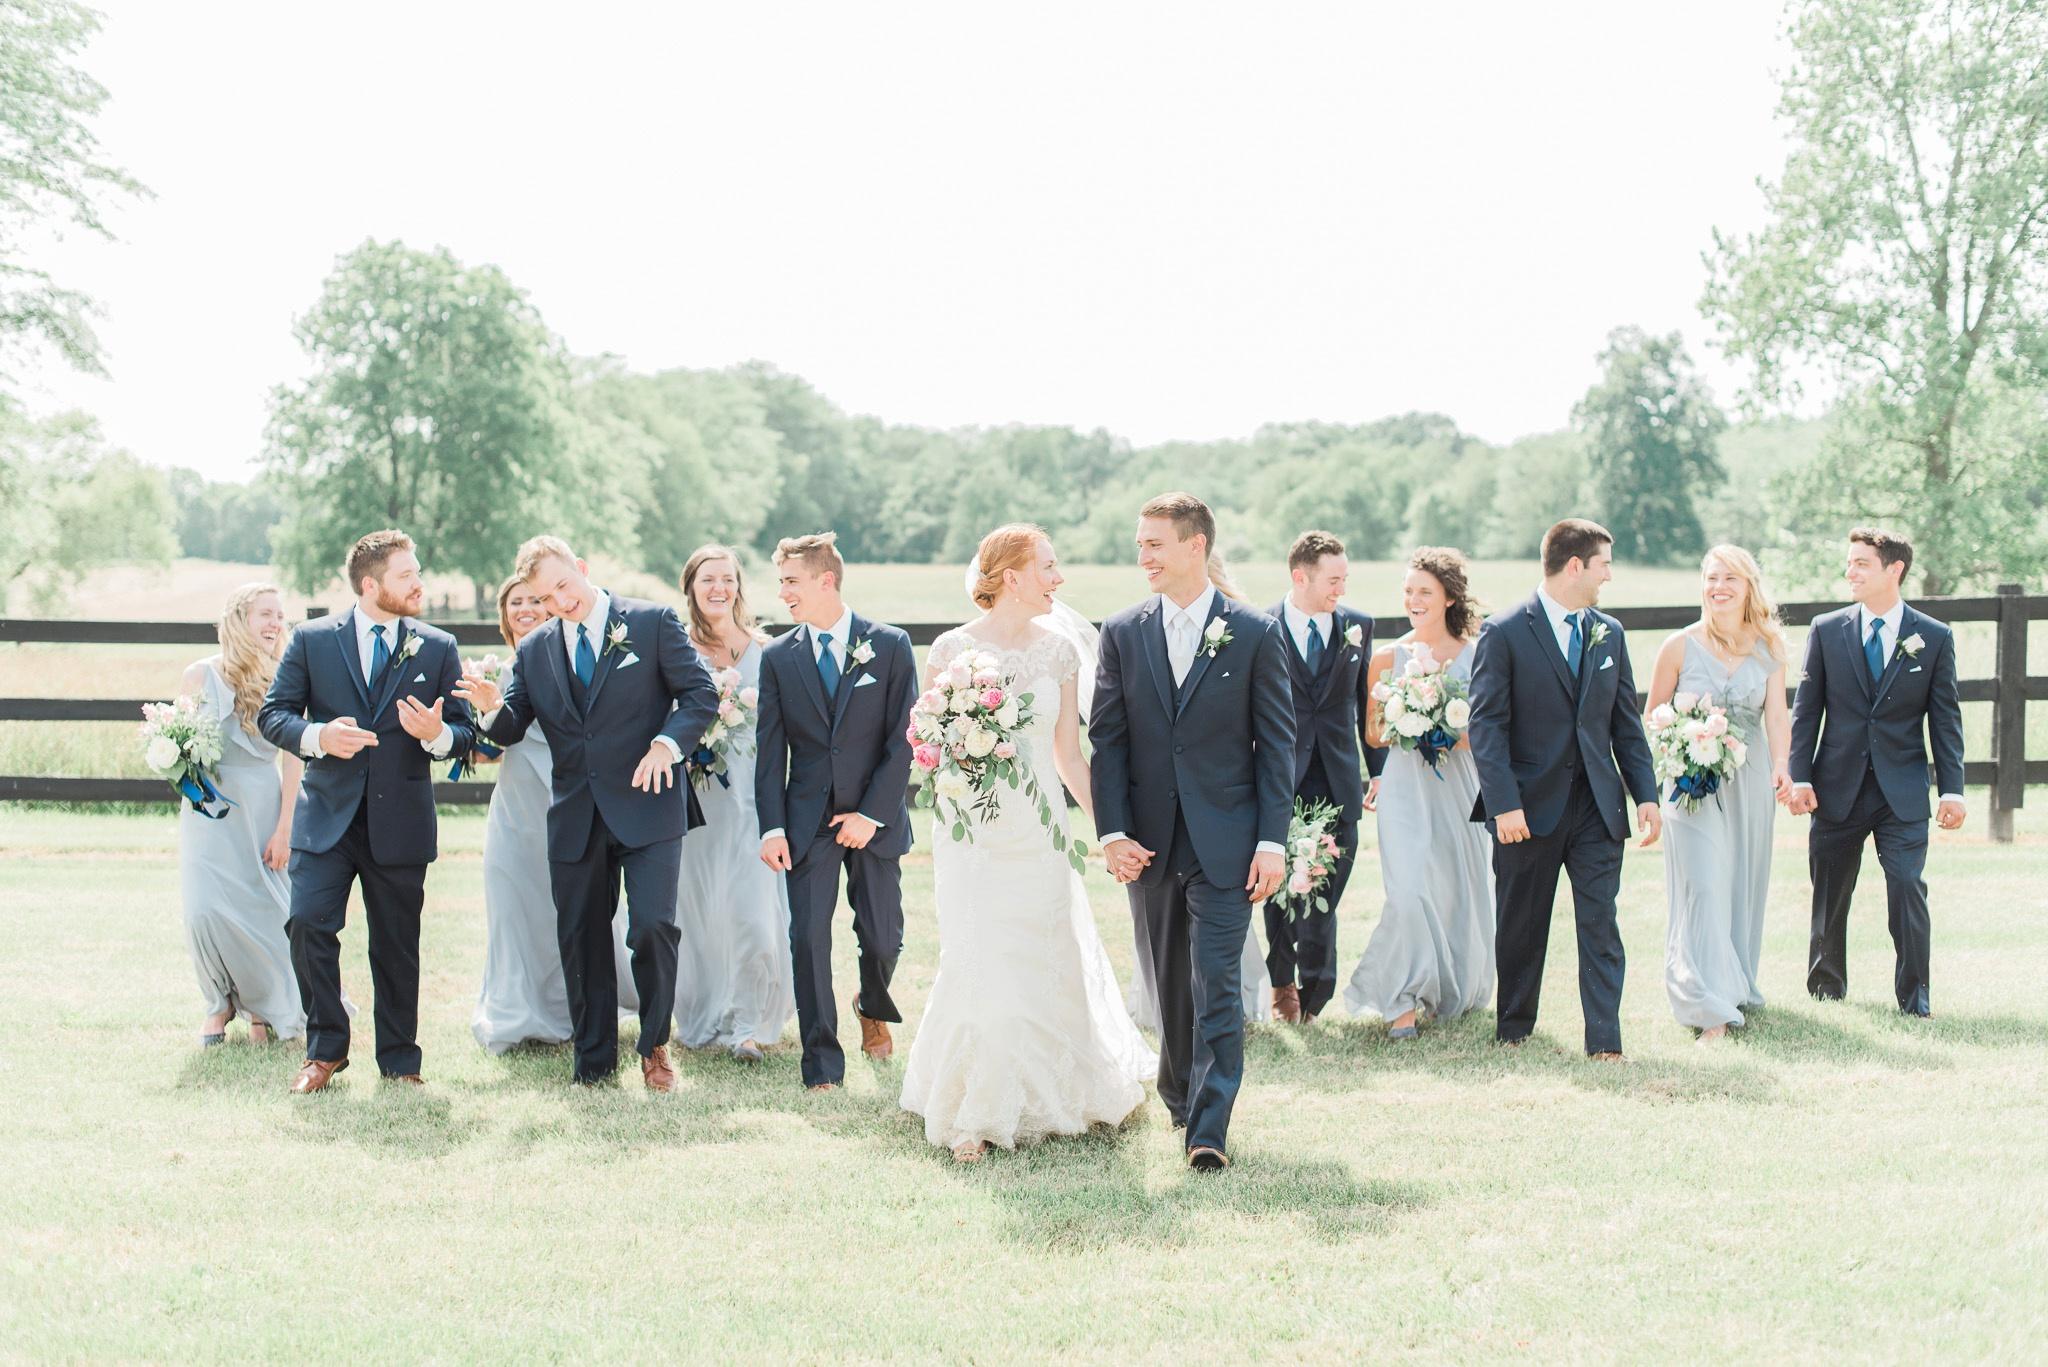 sunbury-ohio-wedding-hannah-johnathan_0068.jpg